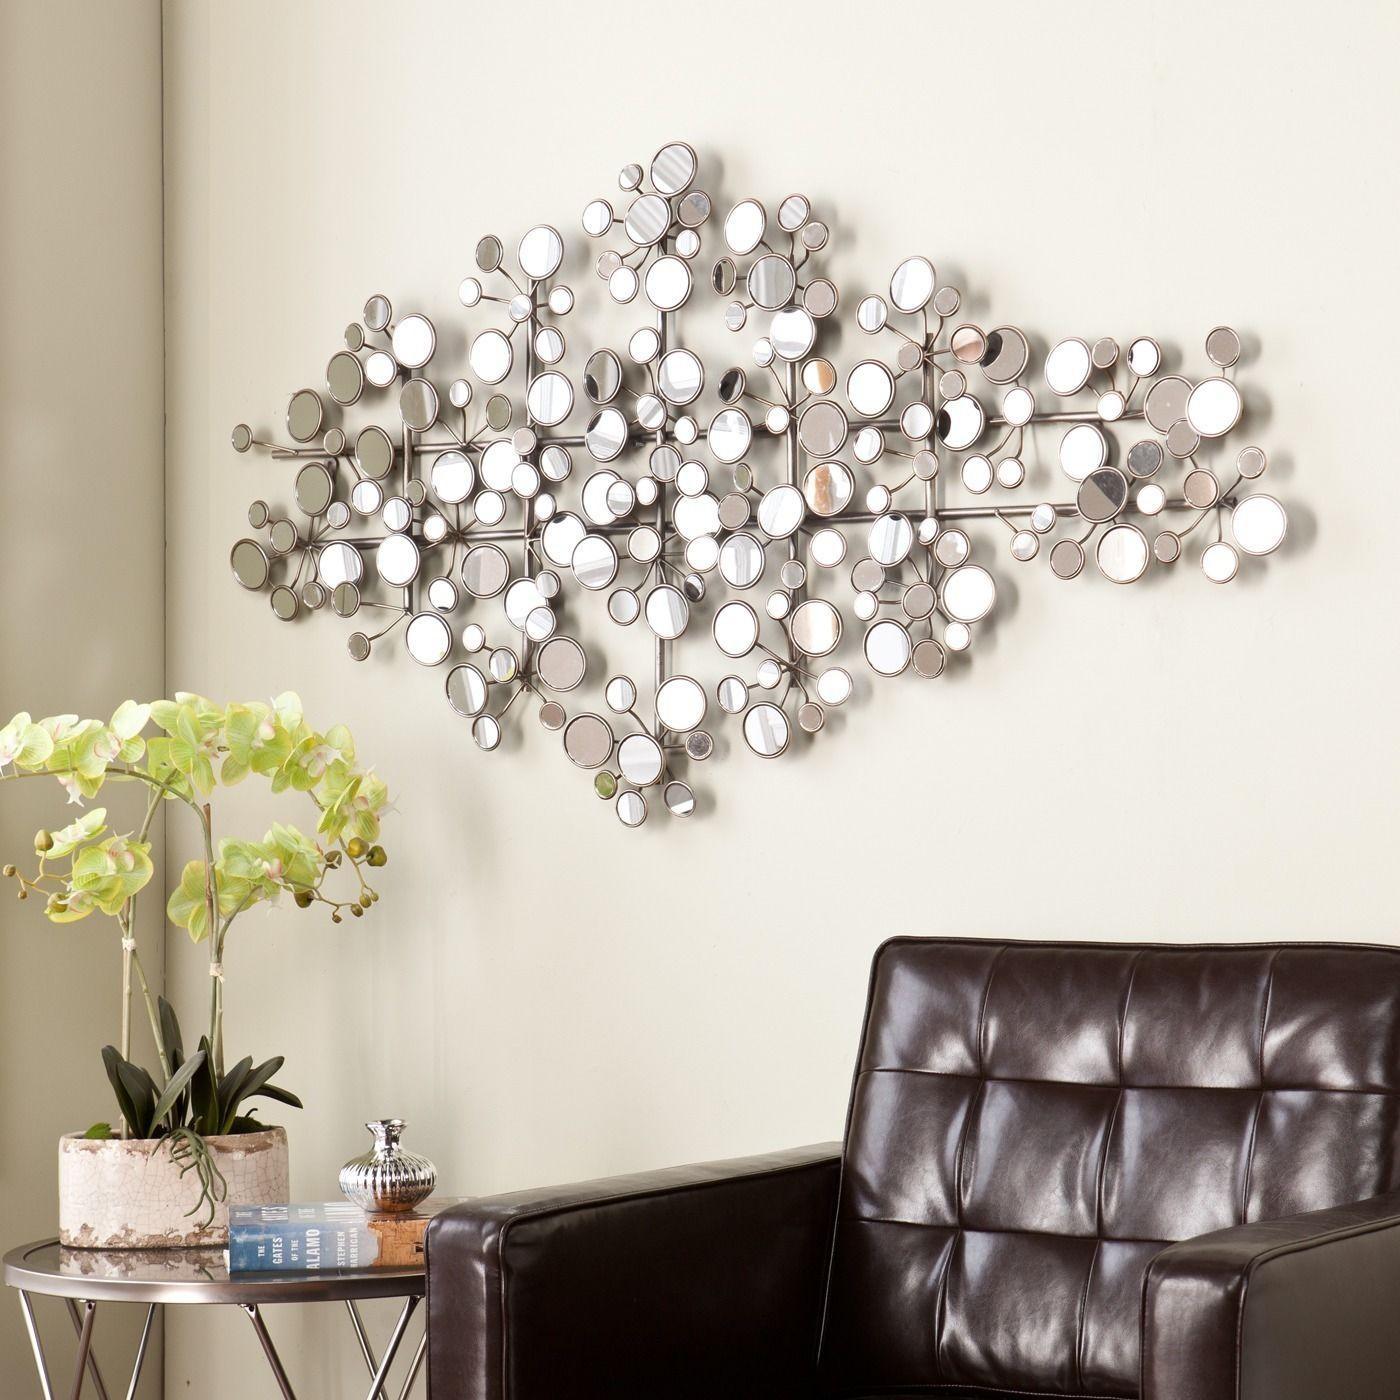 Modern Silver Mirror Circle Metal Wall Sculpture Art Modern For Modern Mirrored Wall Art (Image 11 of 20)